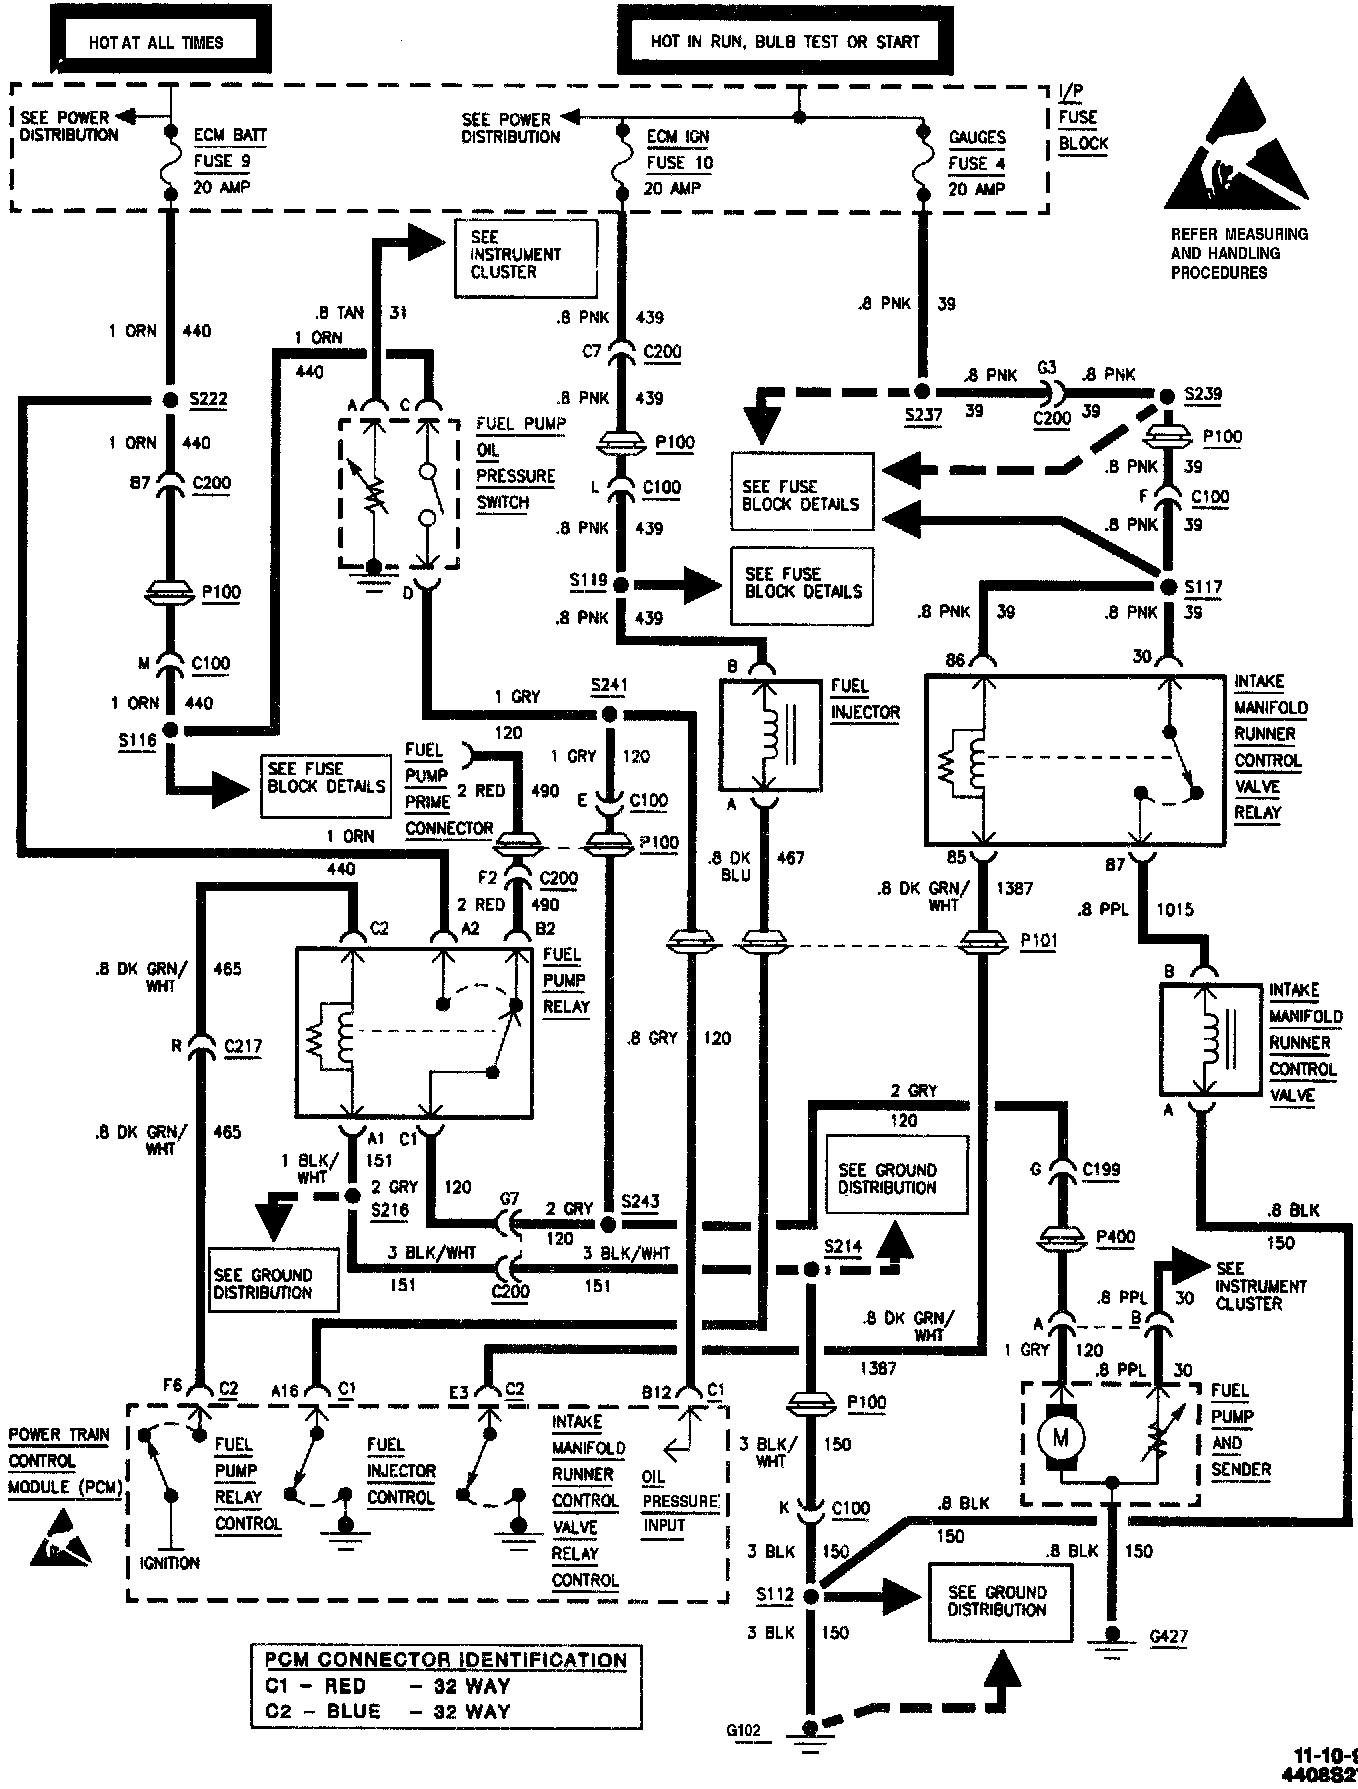 1996 Chevy Blazer Dash Wiring Diagram Pioneer Car Stereo Wiring Harness Bege Wiring Diagram